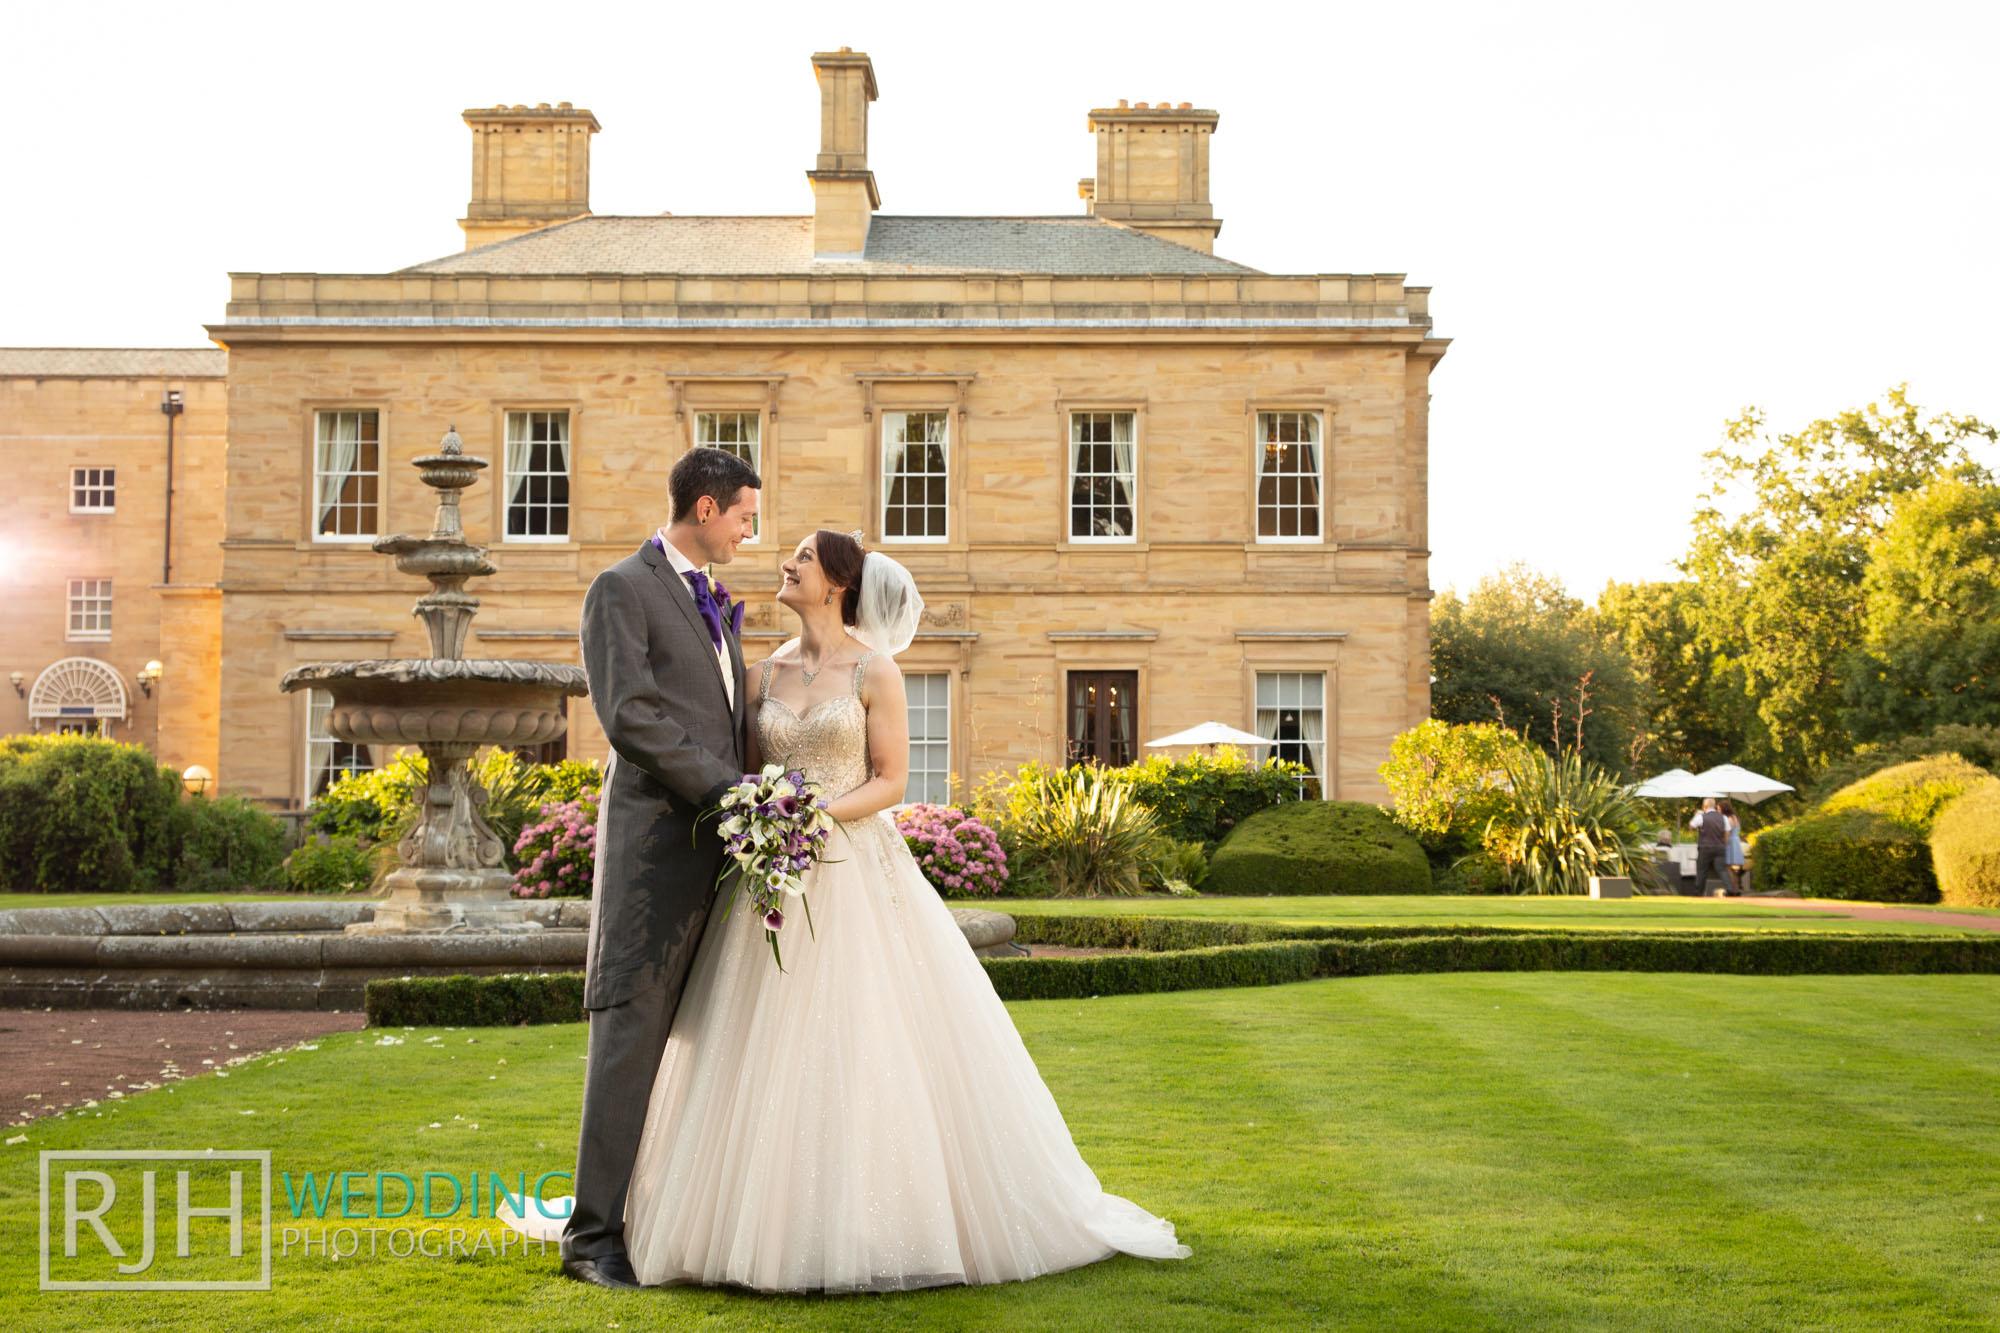 Oulton Hall Wedding Photography_Goodwill-Hall_042_IMG_6830.jpg